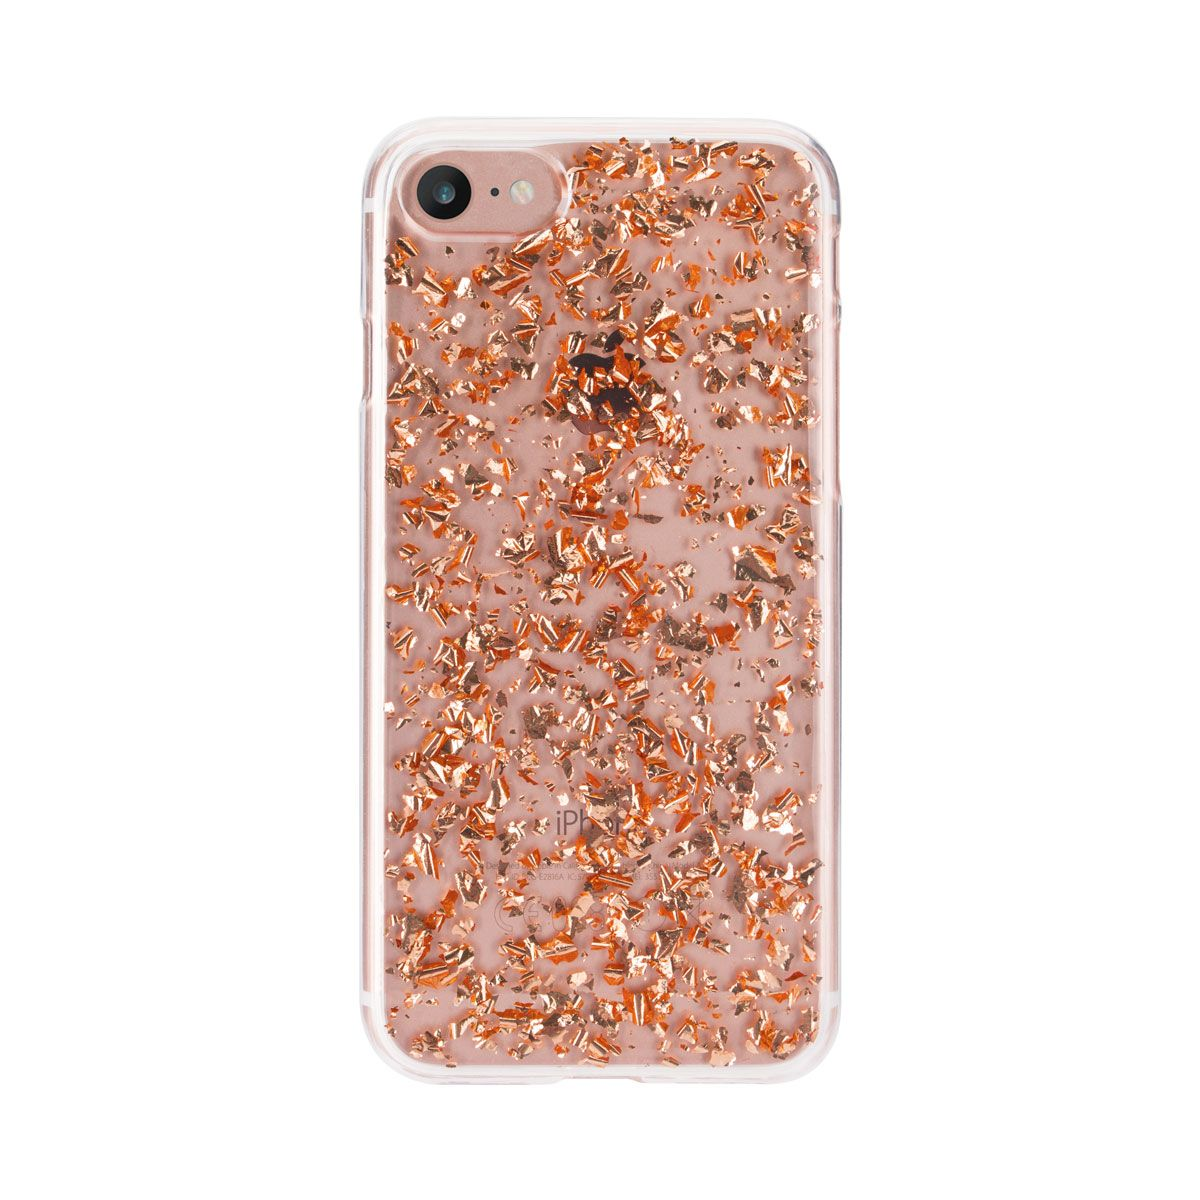 Ochranný kryt pro iPhone 8 / 7 / 6s / 6 - FLAVR, FLAKES ROSE GOLD